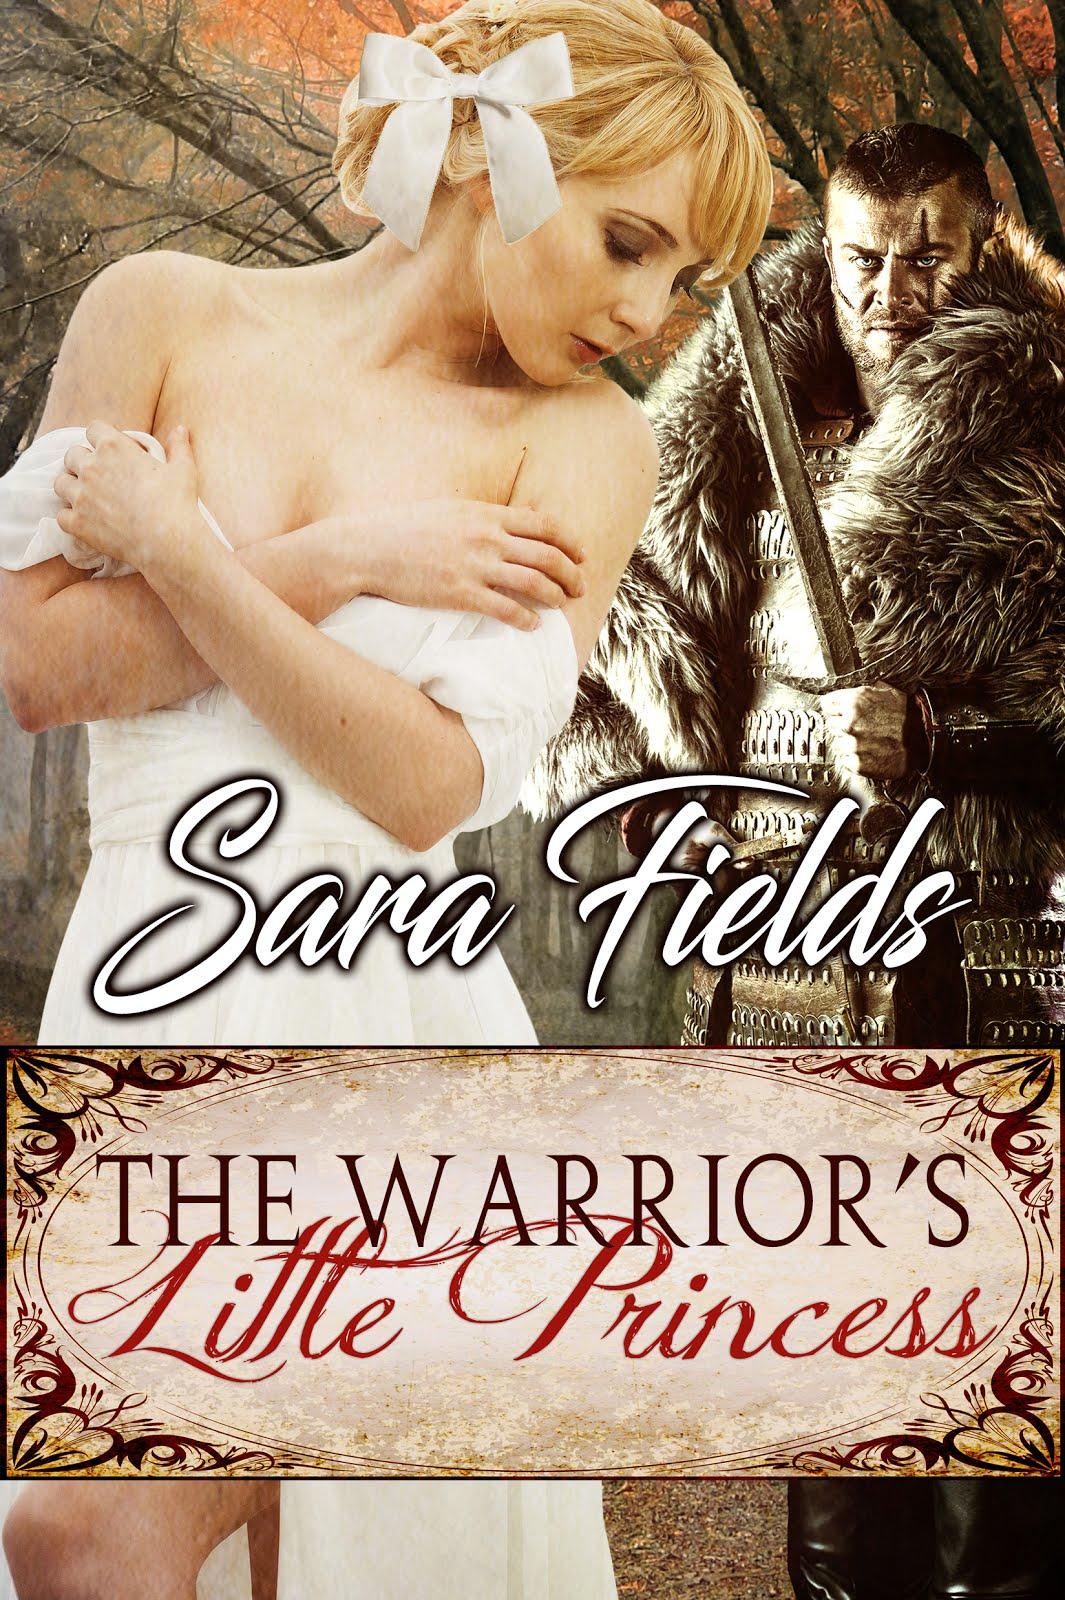 The Warrior's Little Princess